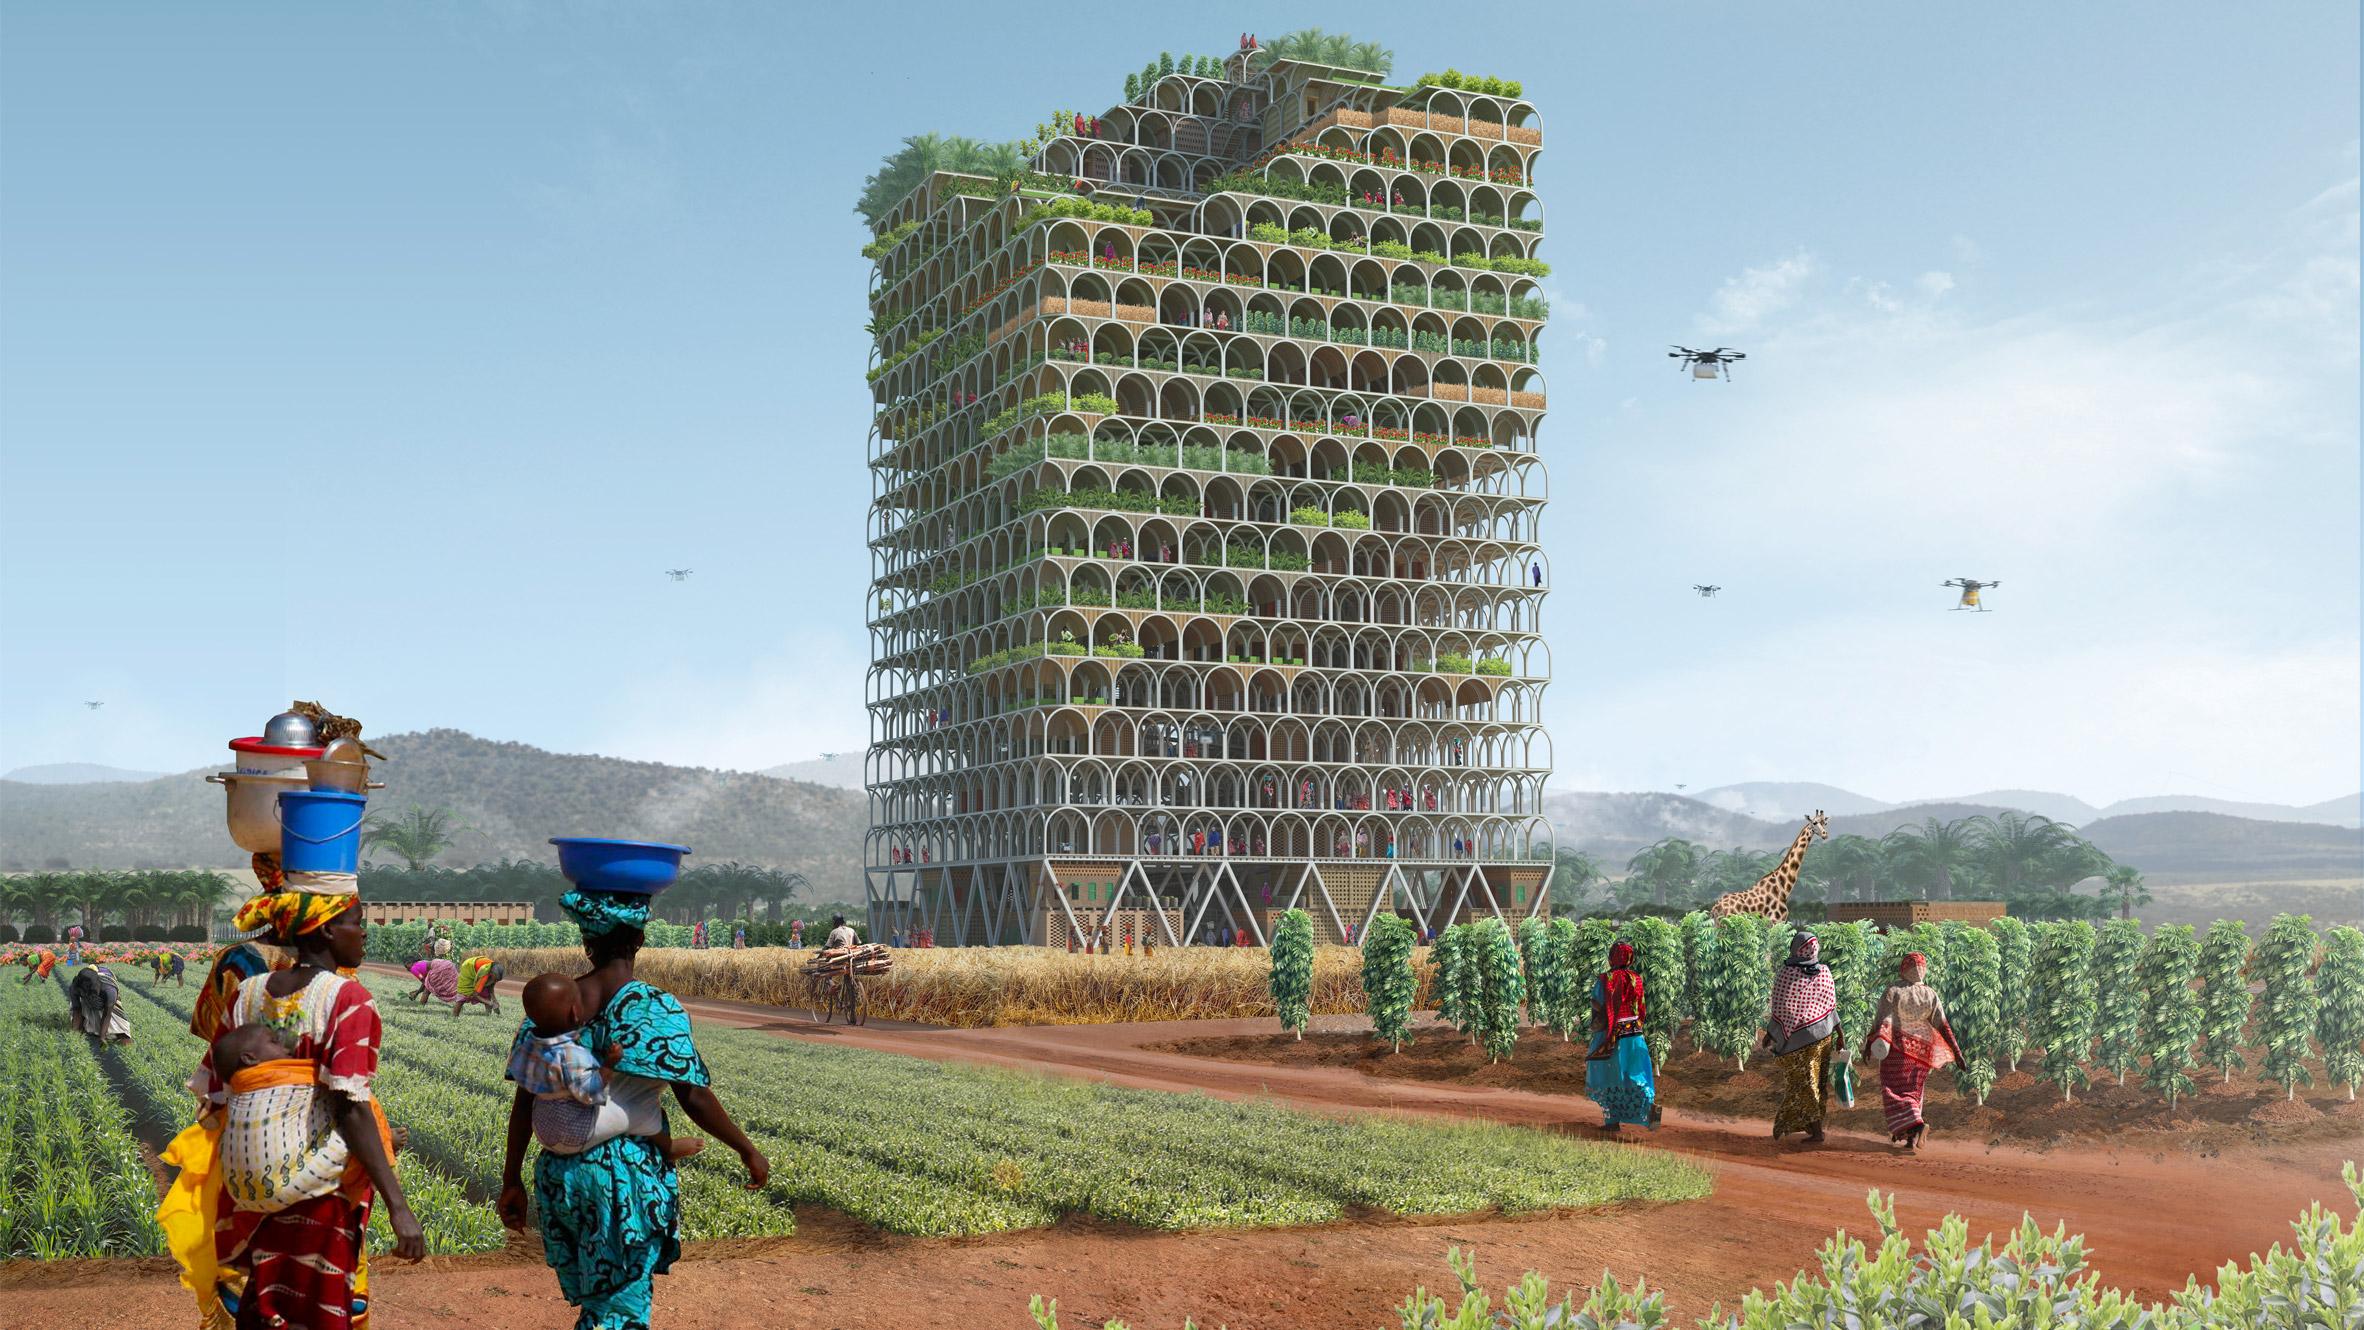 mashambas-sub-saharan-africa-farm-modular-drone-first-place-1st-lipinski-frankowski-evolo-skyscraper-competition-2017-conceptual-high-rise_dezeen_hero.jpg